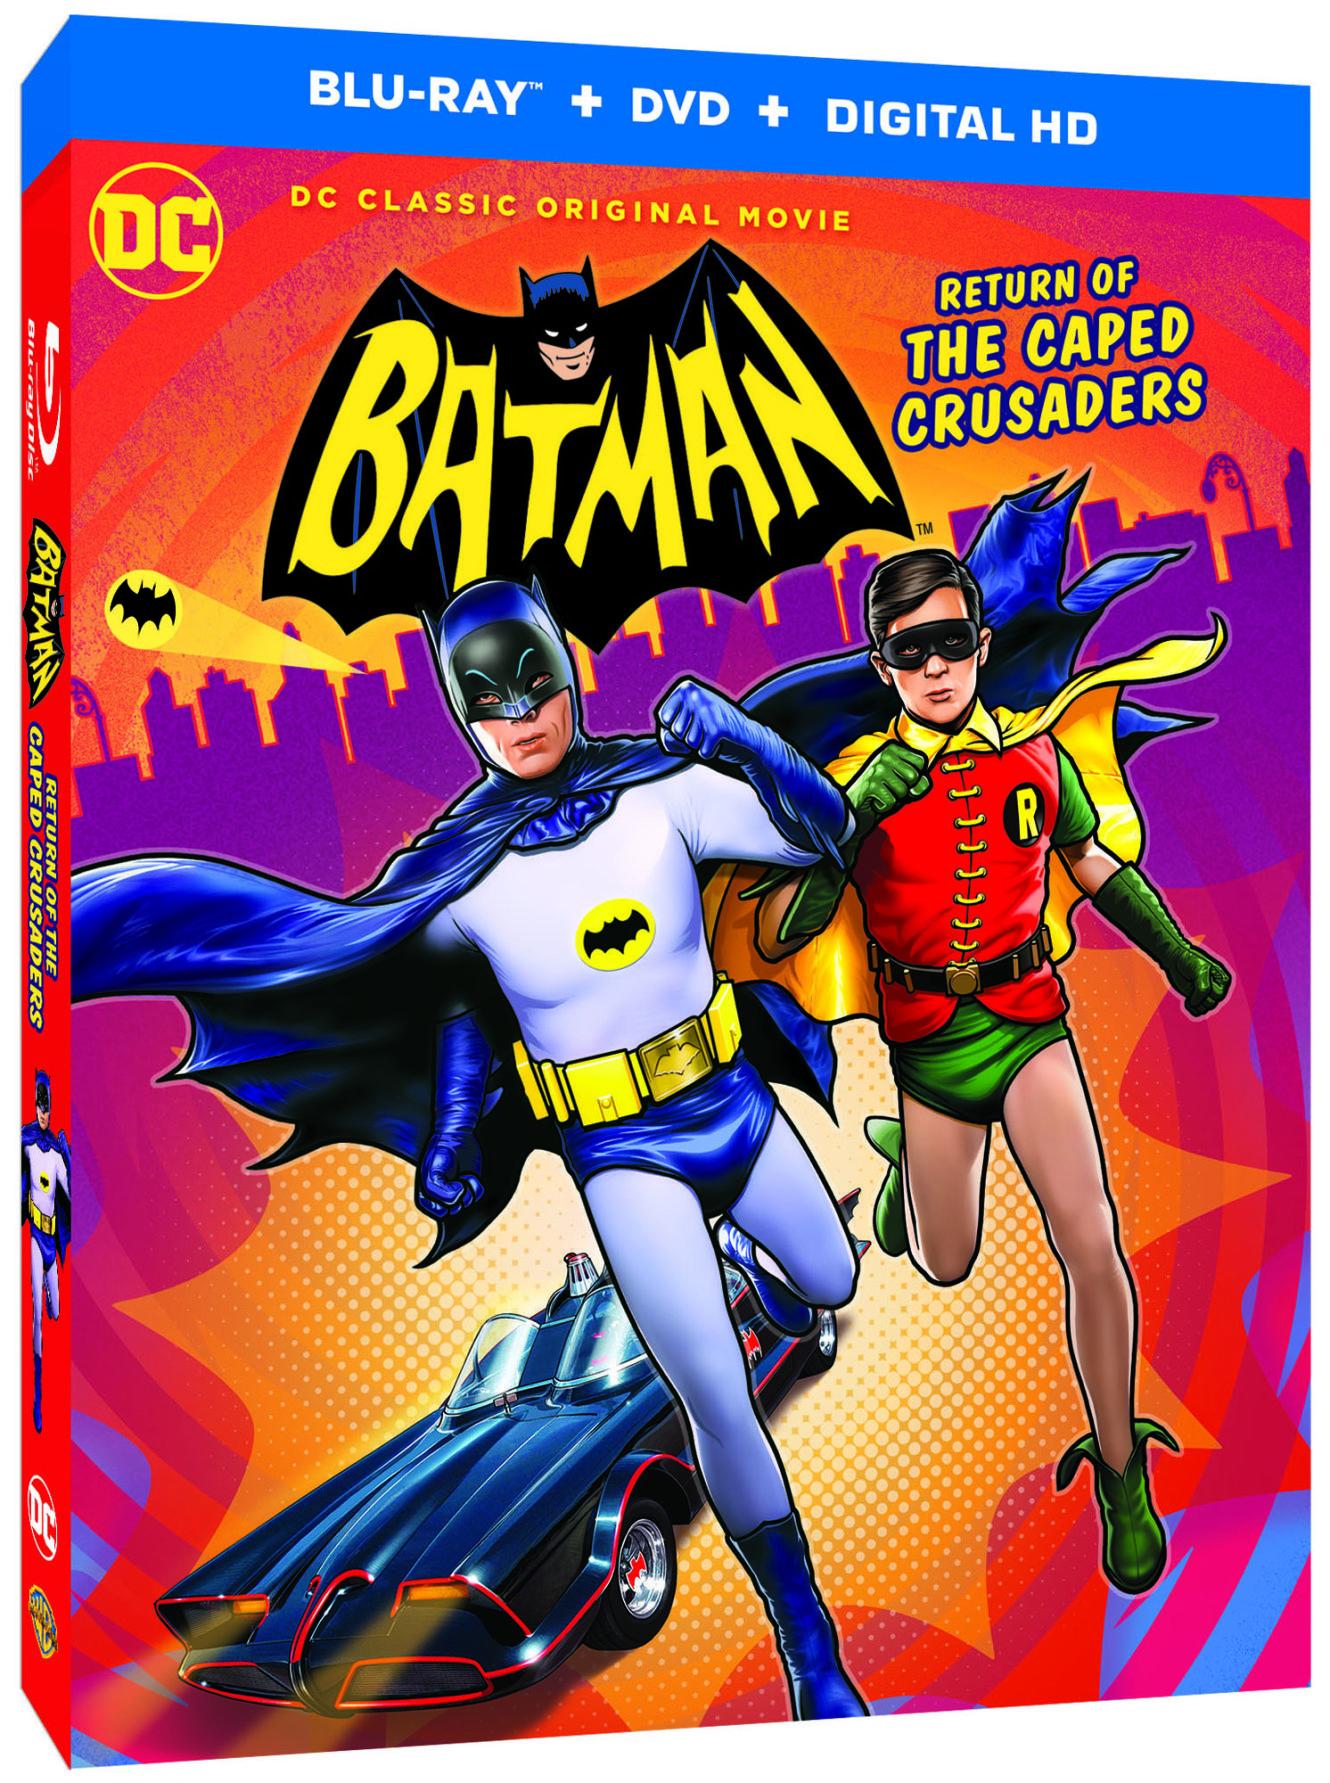 batman-return-of-the-caped-crusaders-box-art